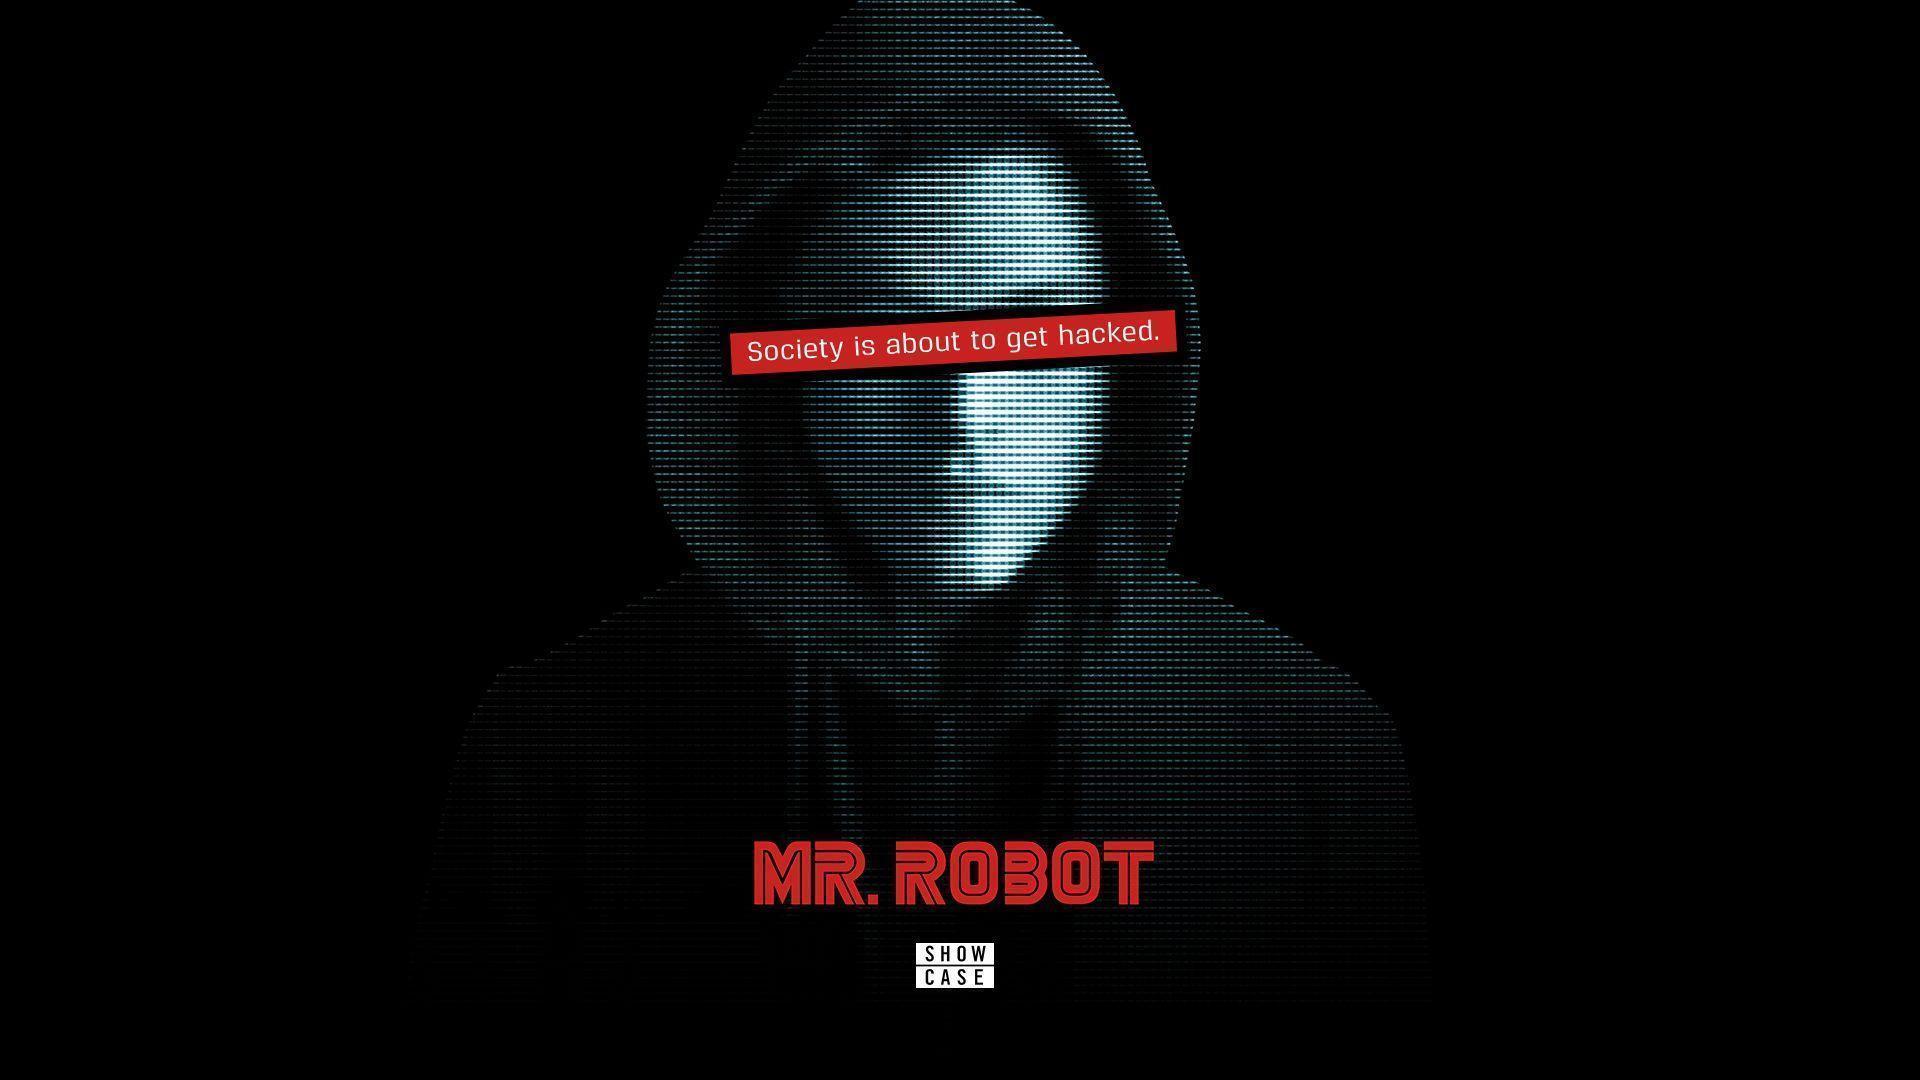 mr robot wallpapers top free mr robot